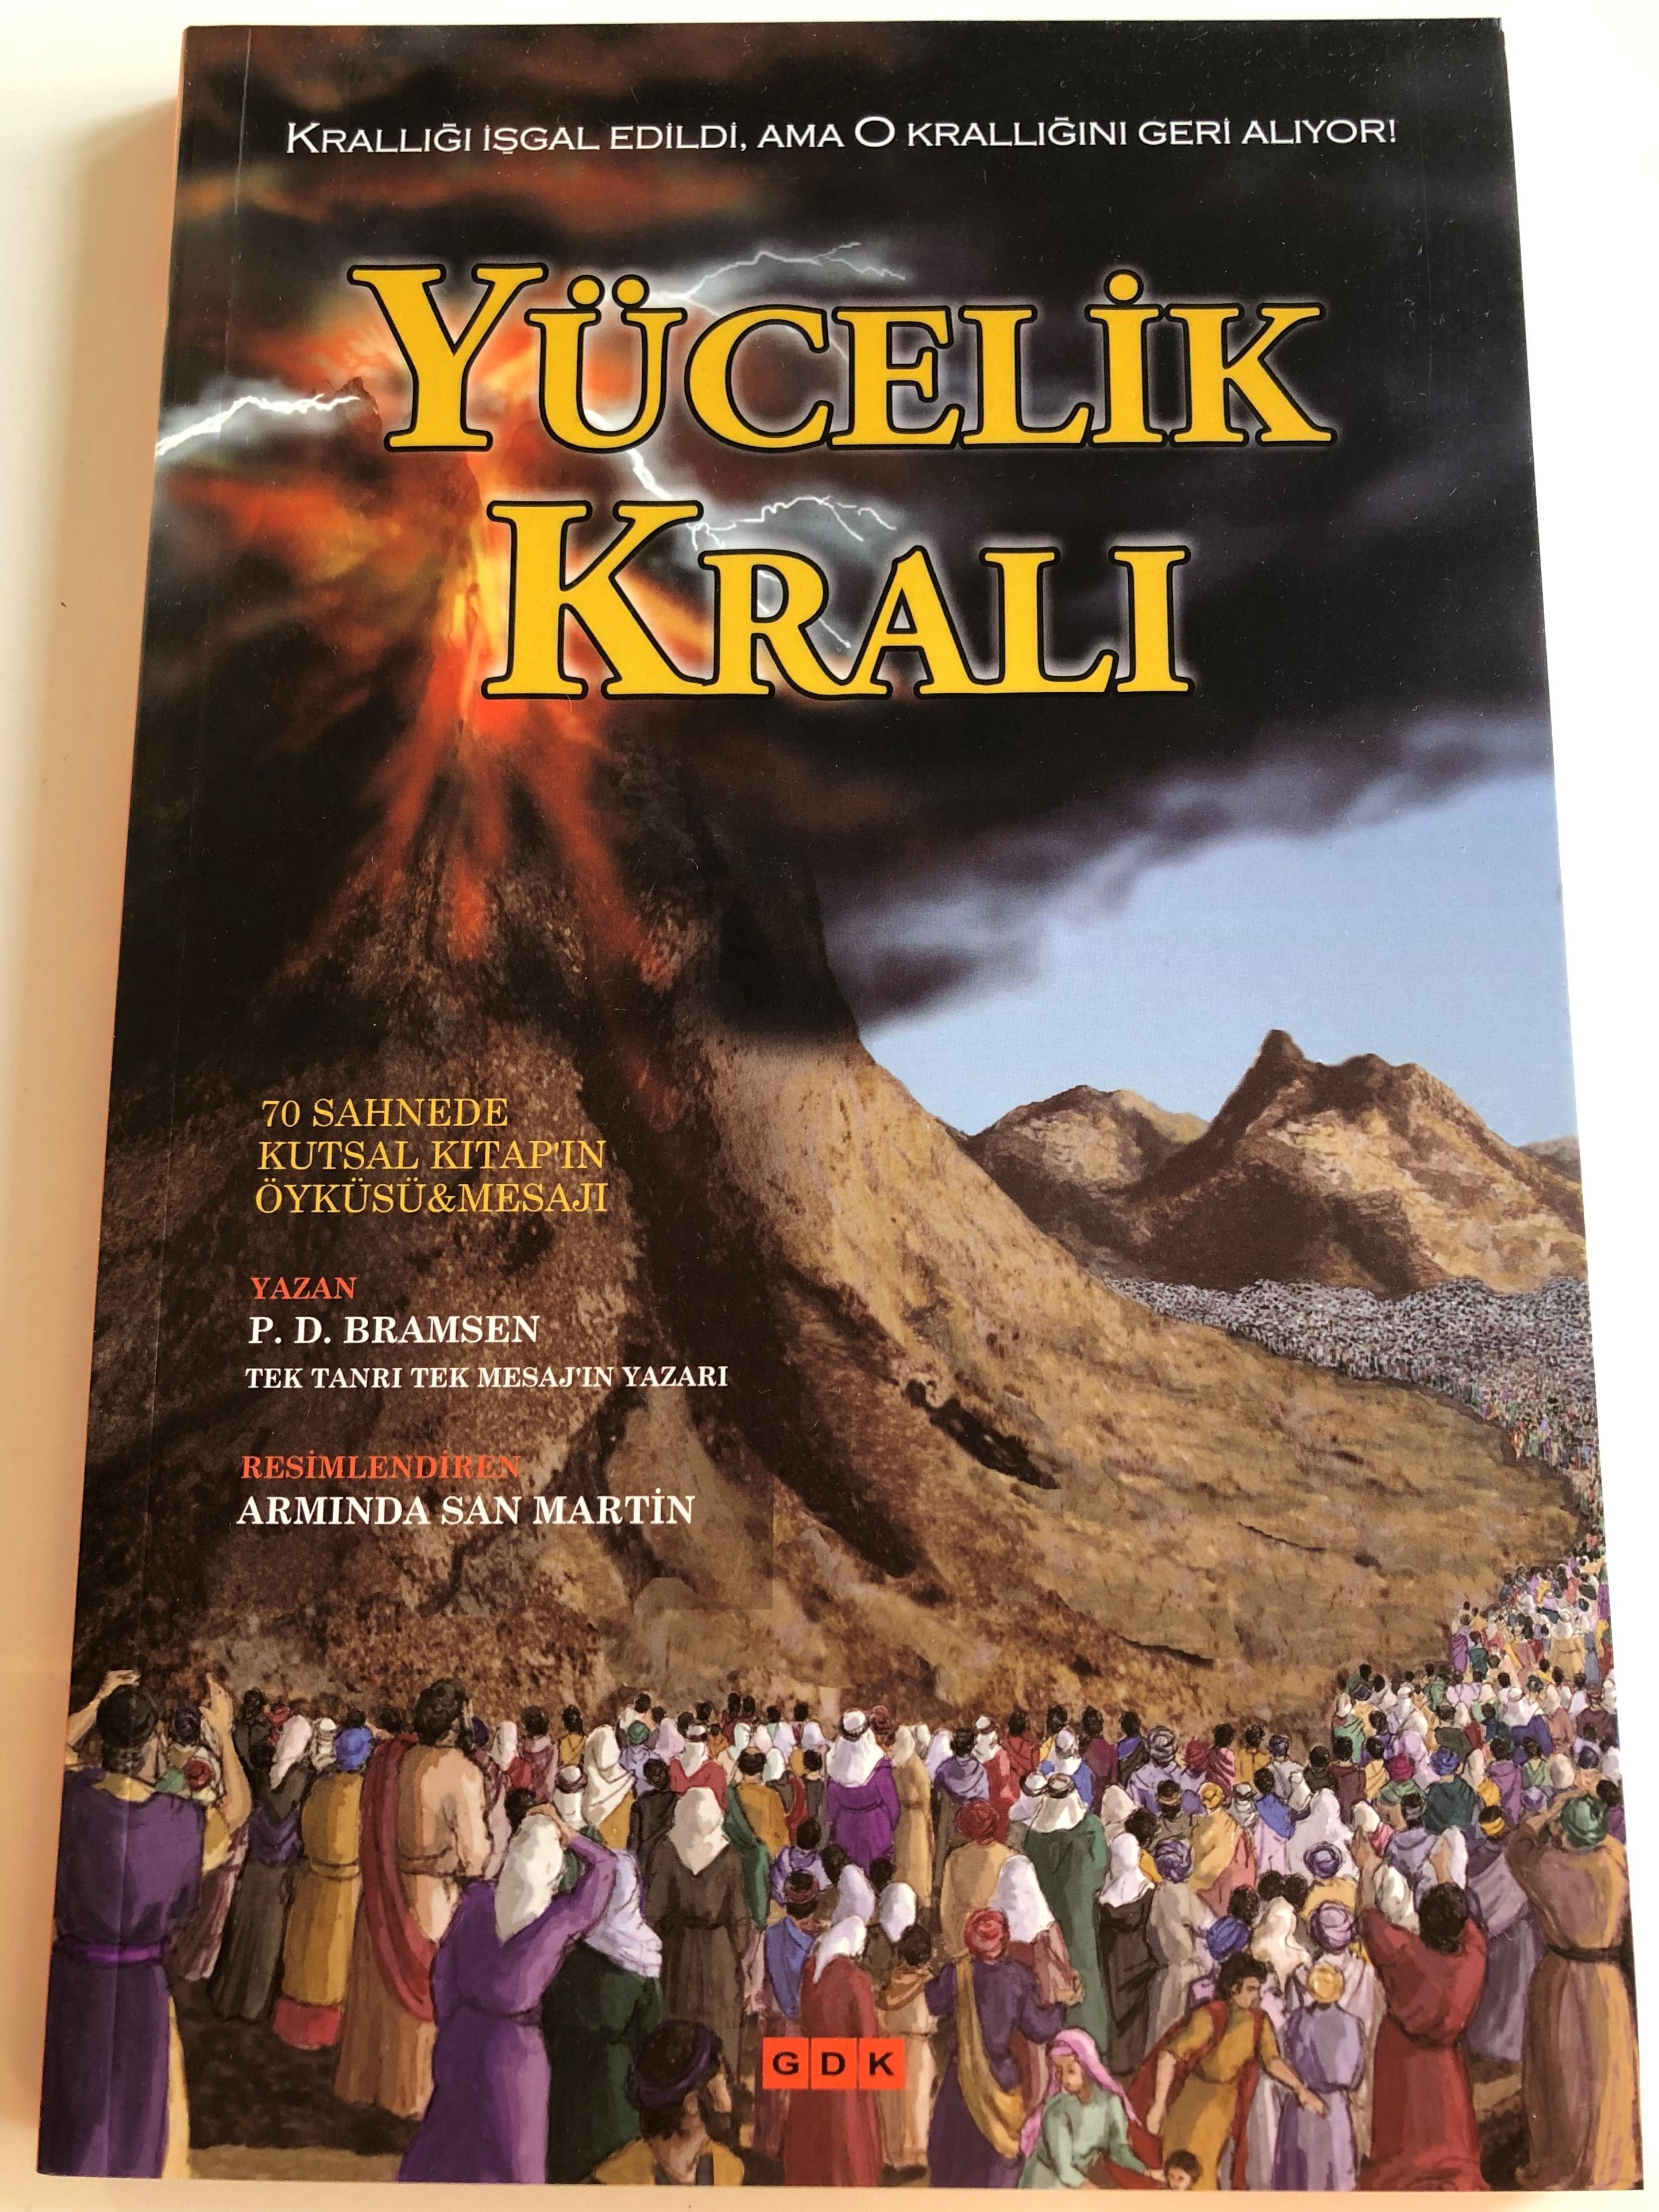 y-celik-krali-king-of-glory-70-bible-stories-for-children-turkish-language-edition-by-p.-d.-bramsen-1.jpg